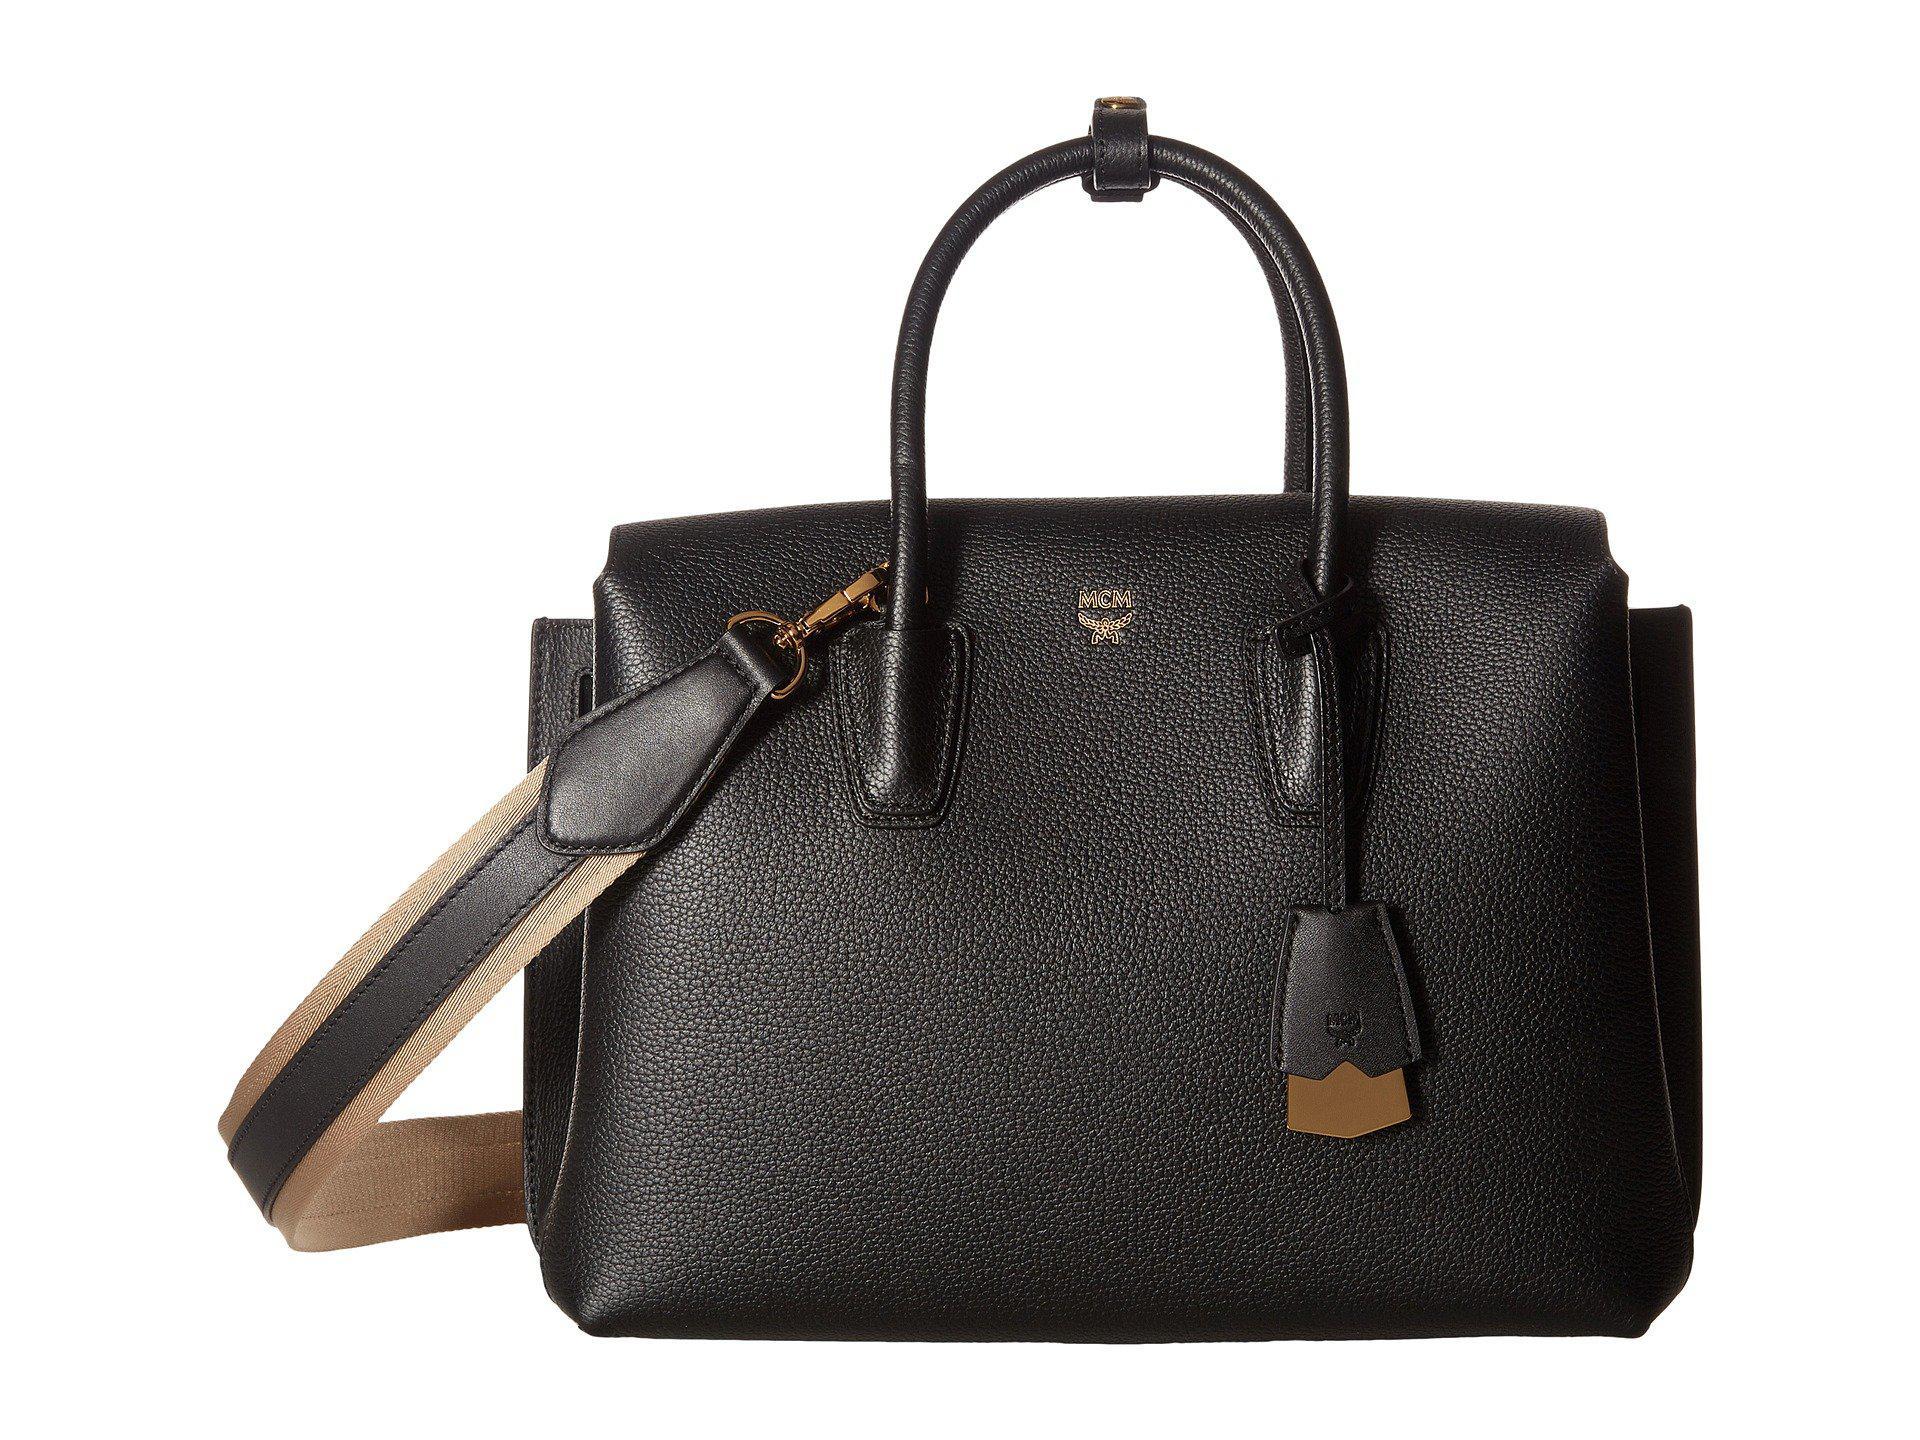 da64d53ad Lyst - MCM Milla Medium Tote (black) Handbags in Black